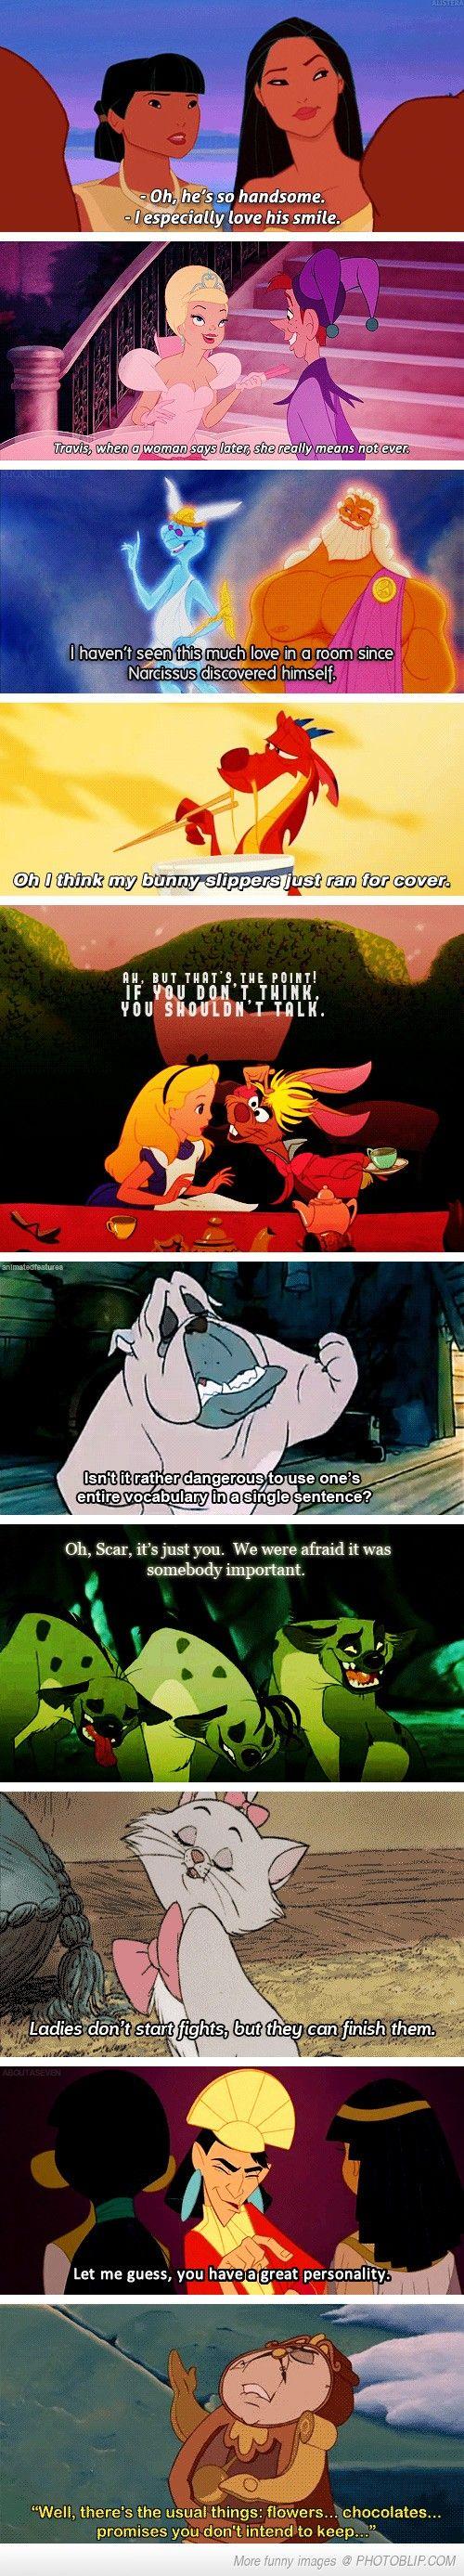 My All Time Favorite Disney Quotes Disney Funny Disney Quotes Disney Love